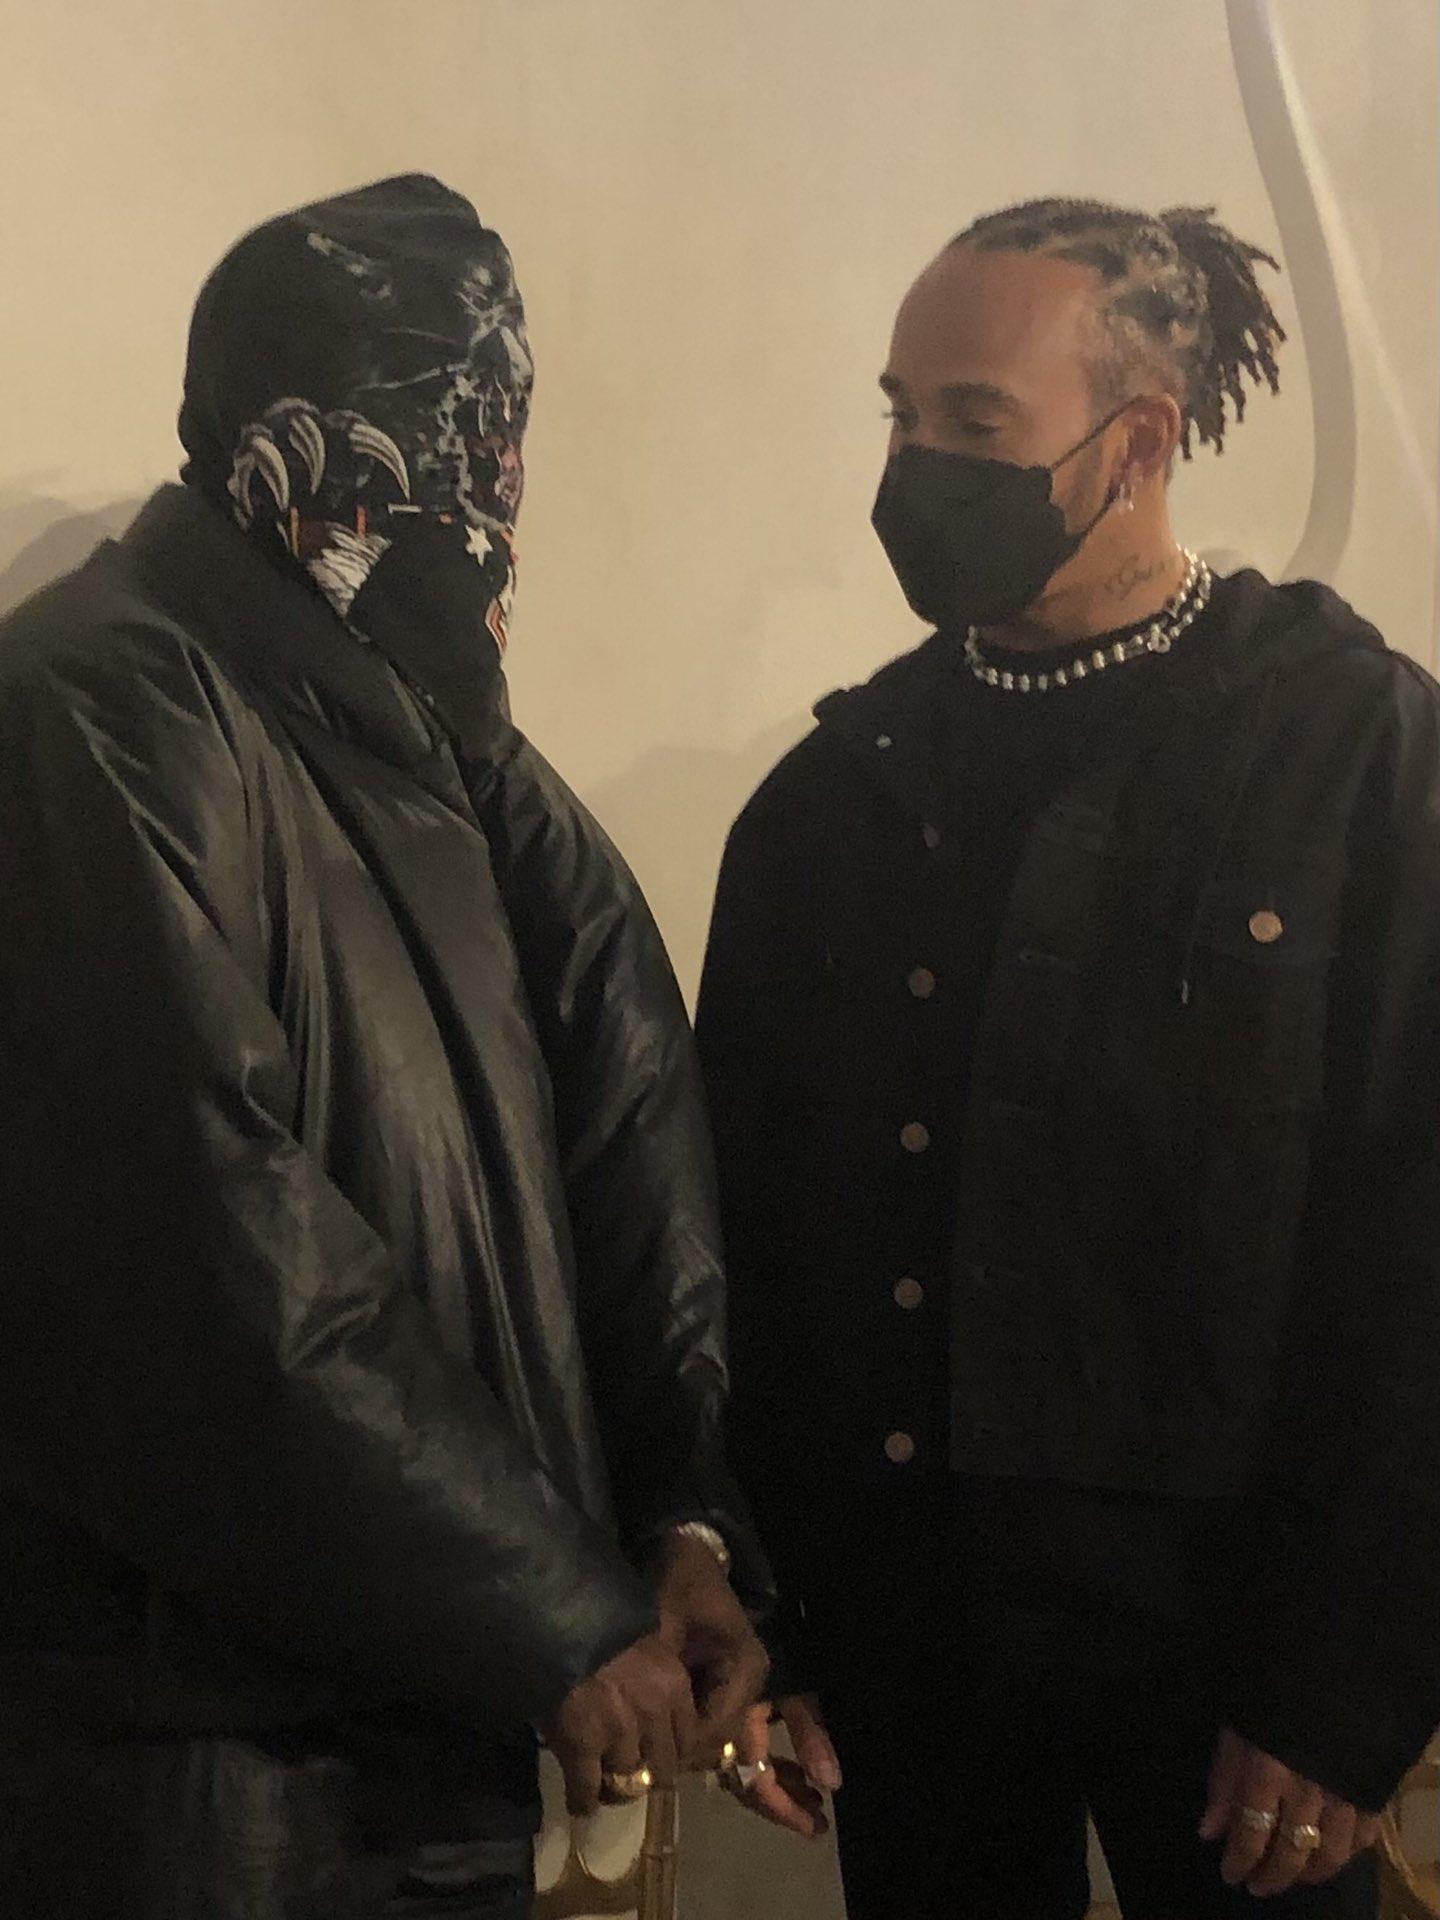 Kanye West 疑似著用全新 YEEZY x Gap 聯名設計